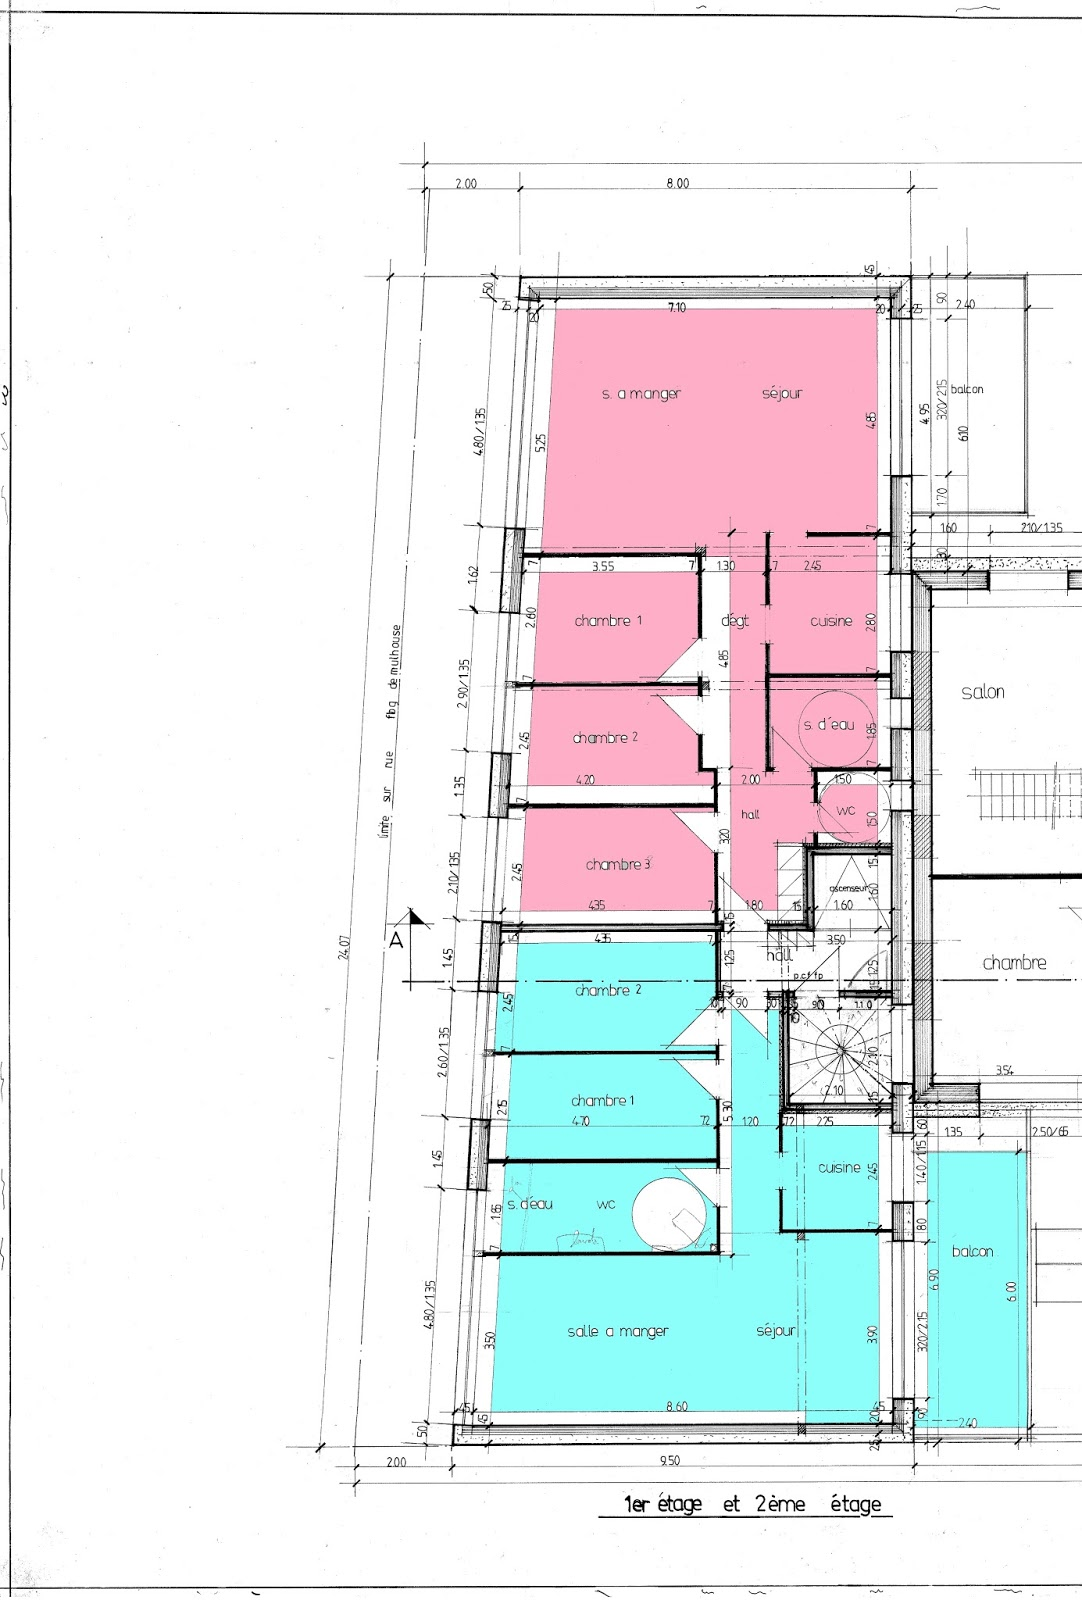 Premier Appartement Liste dedans appartement ds immeuble a kingersheim residence marbella